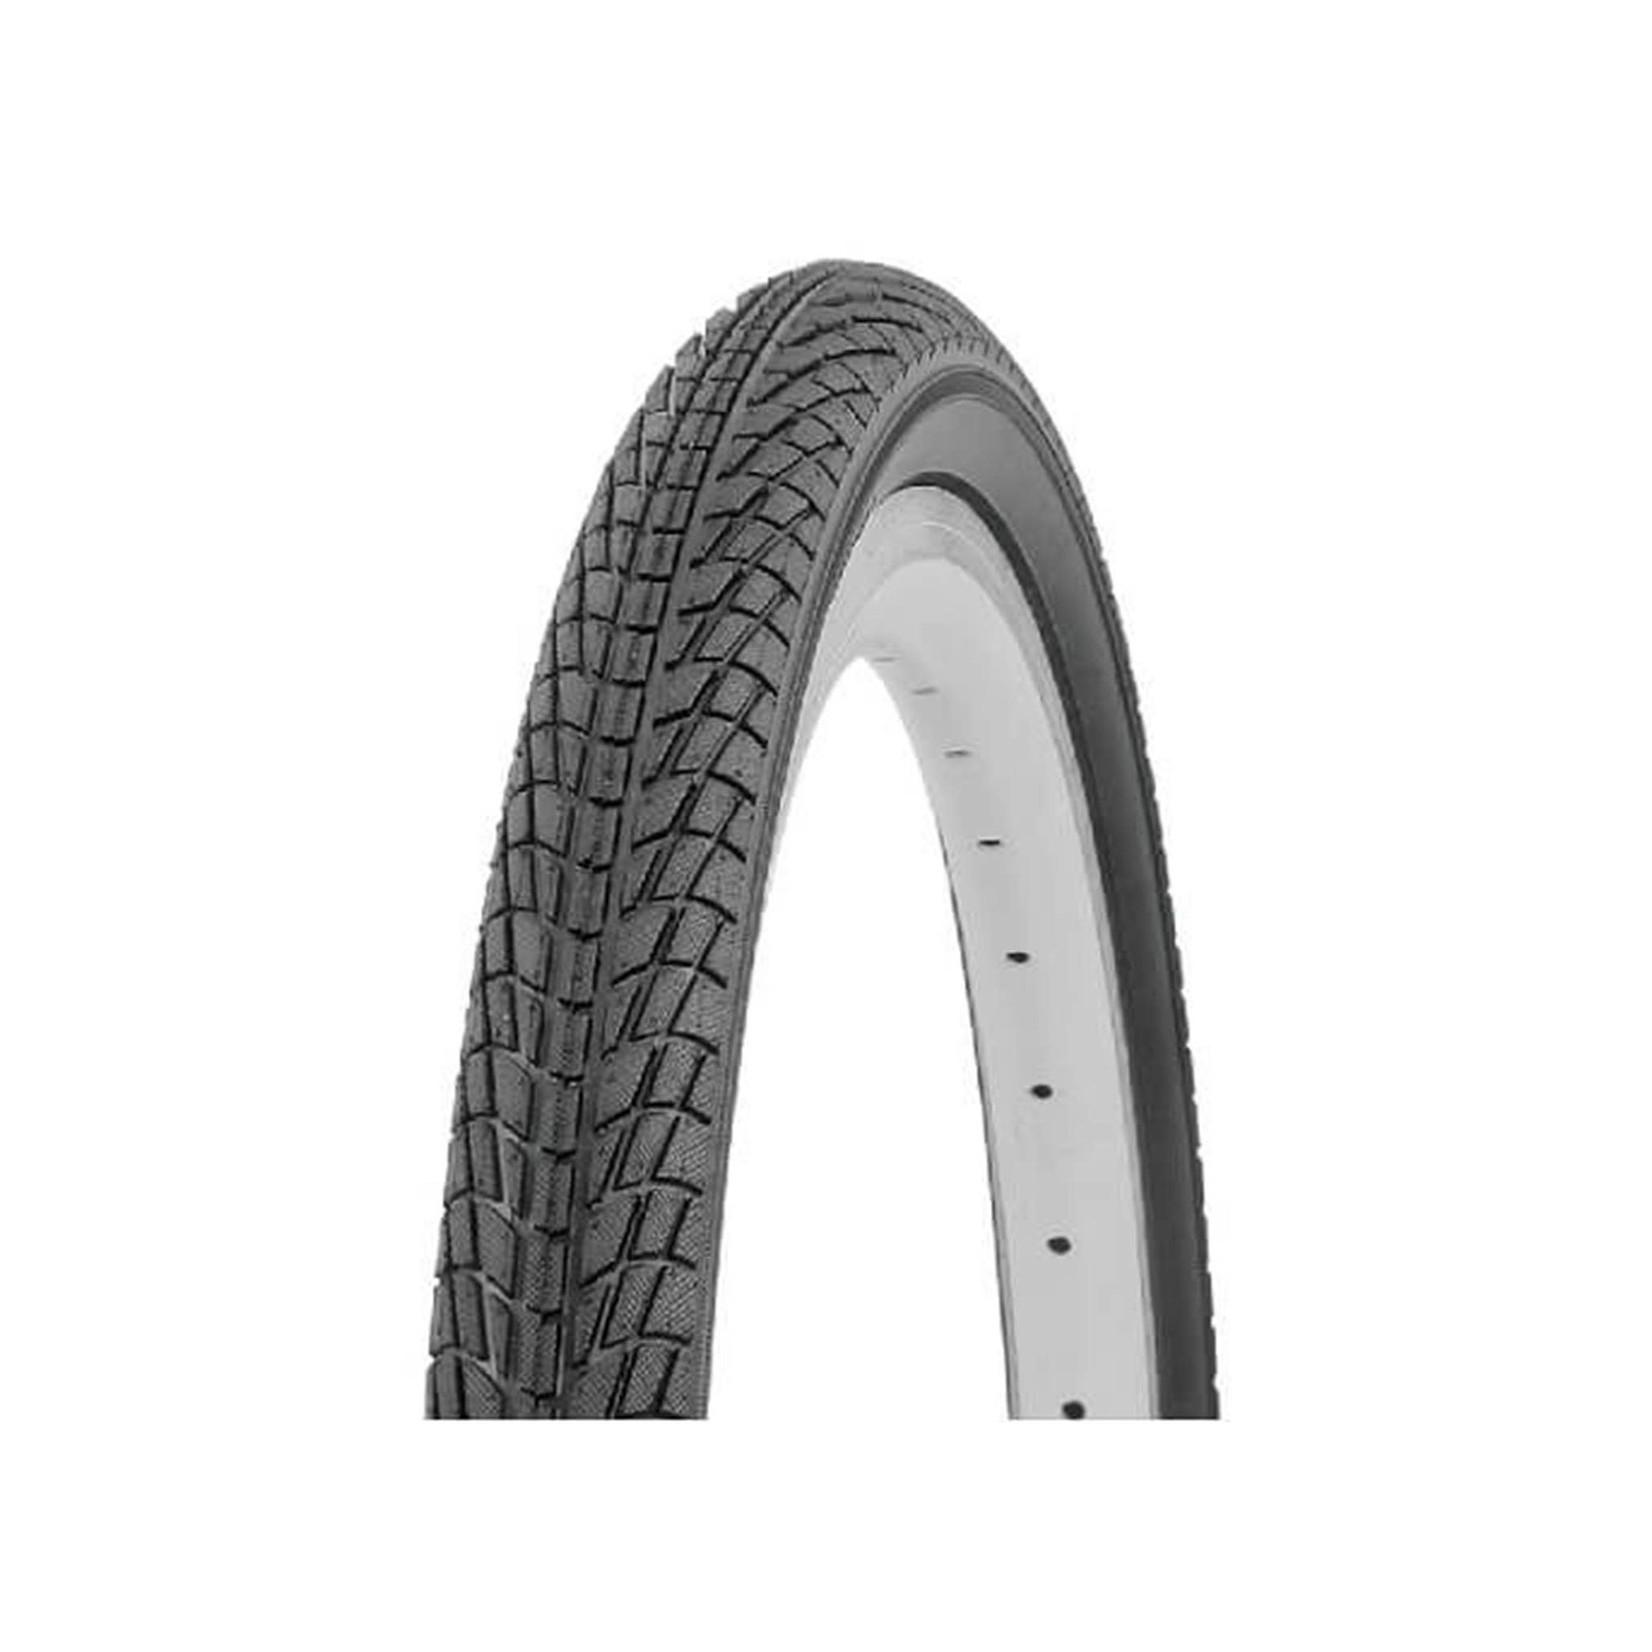 Rocket 24 x 2.125 Slick Tyre